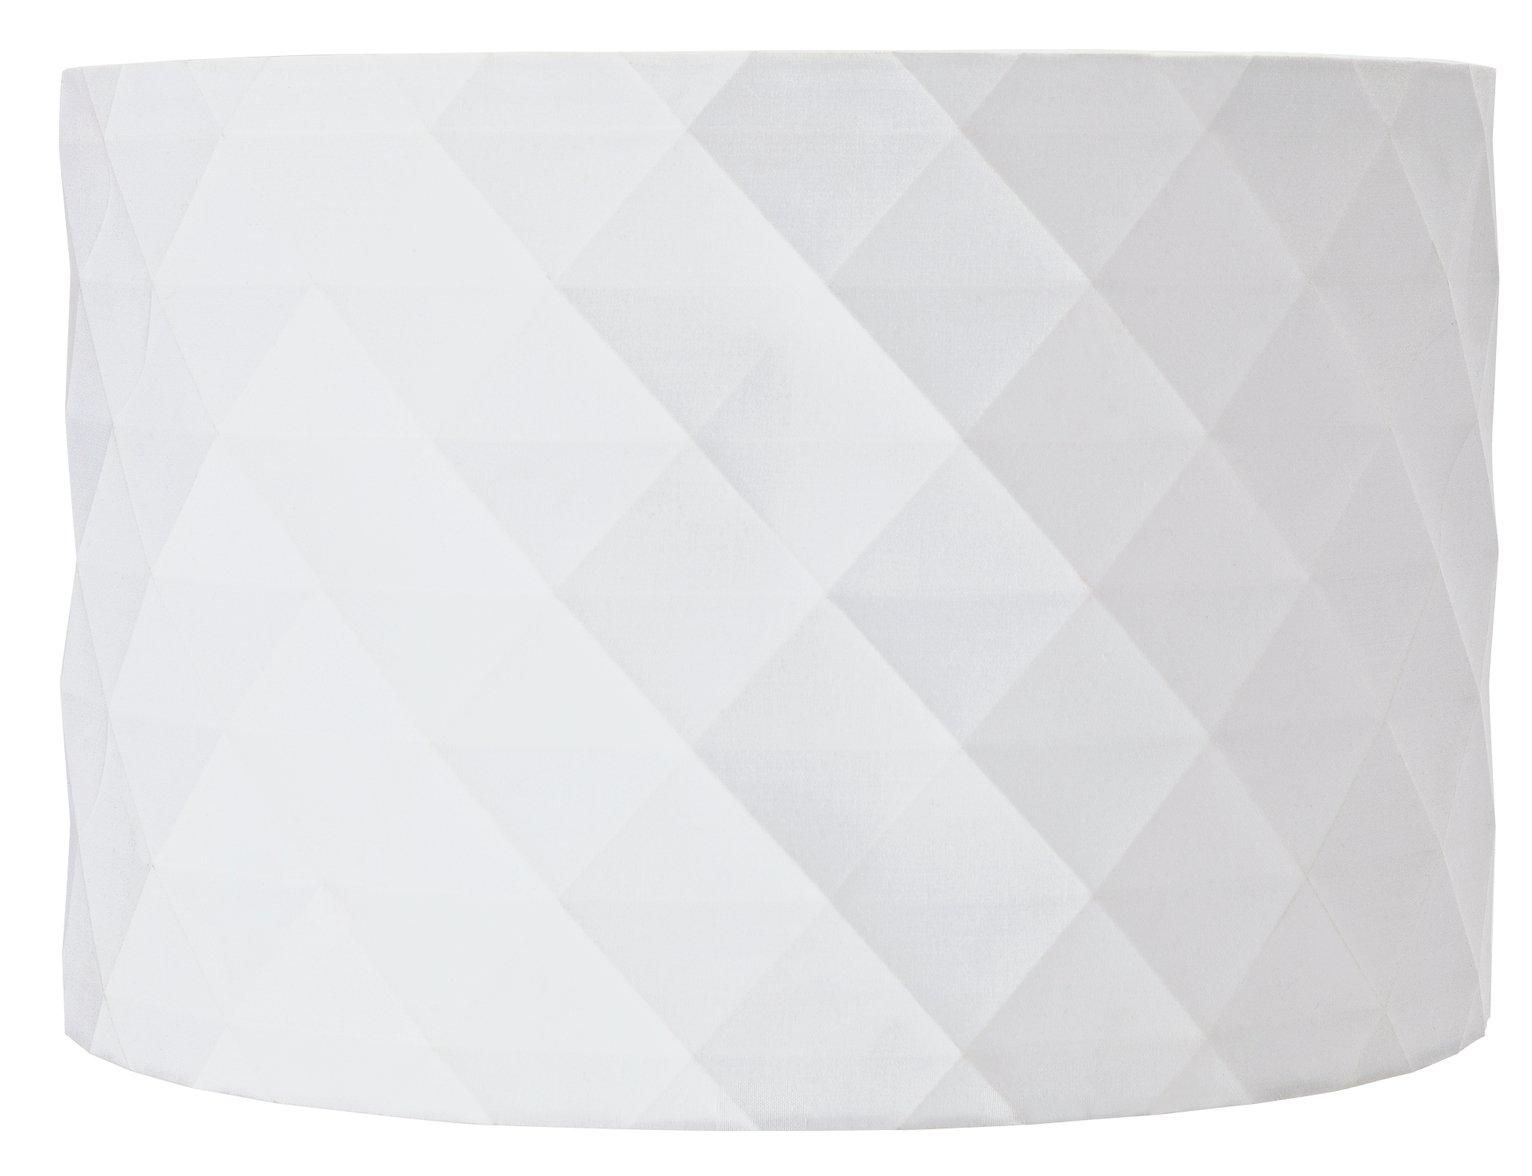 Argos Home Diamond Patterned Shade - White